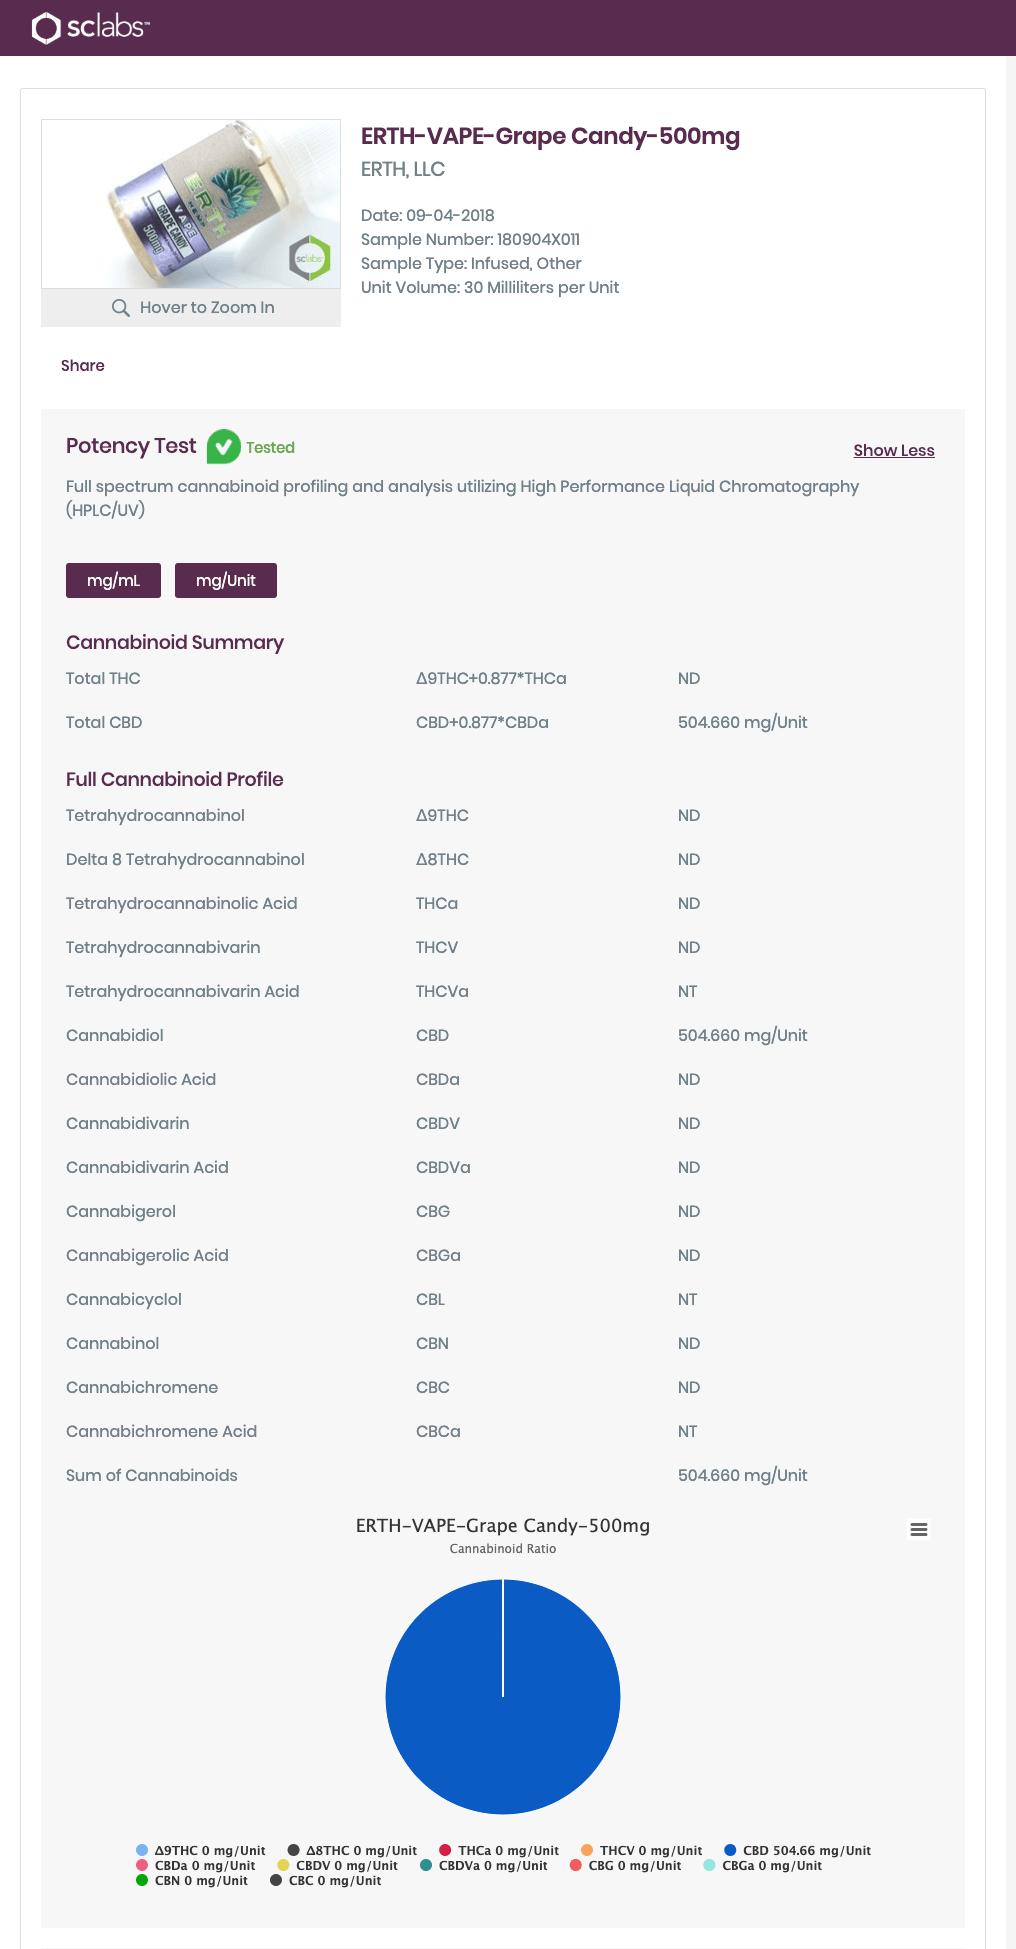 ERTH Hemp Grape Candy CBD Vape Juice 500mg